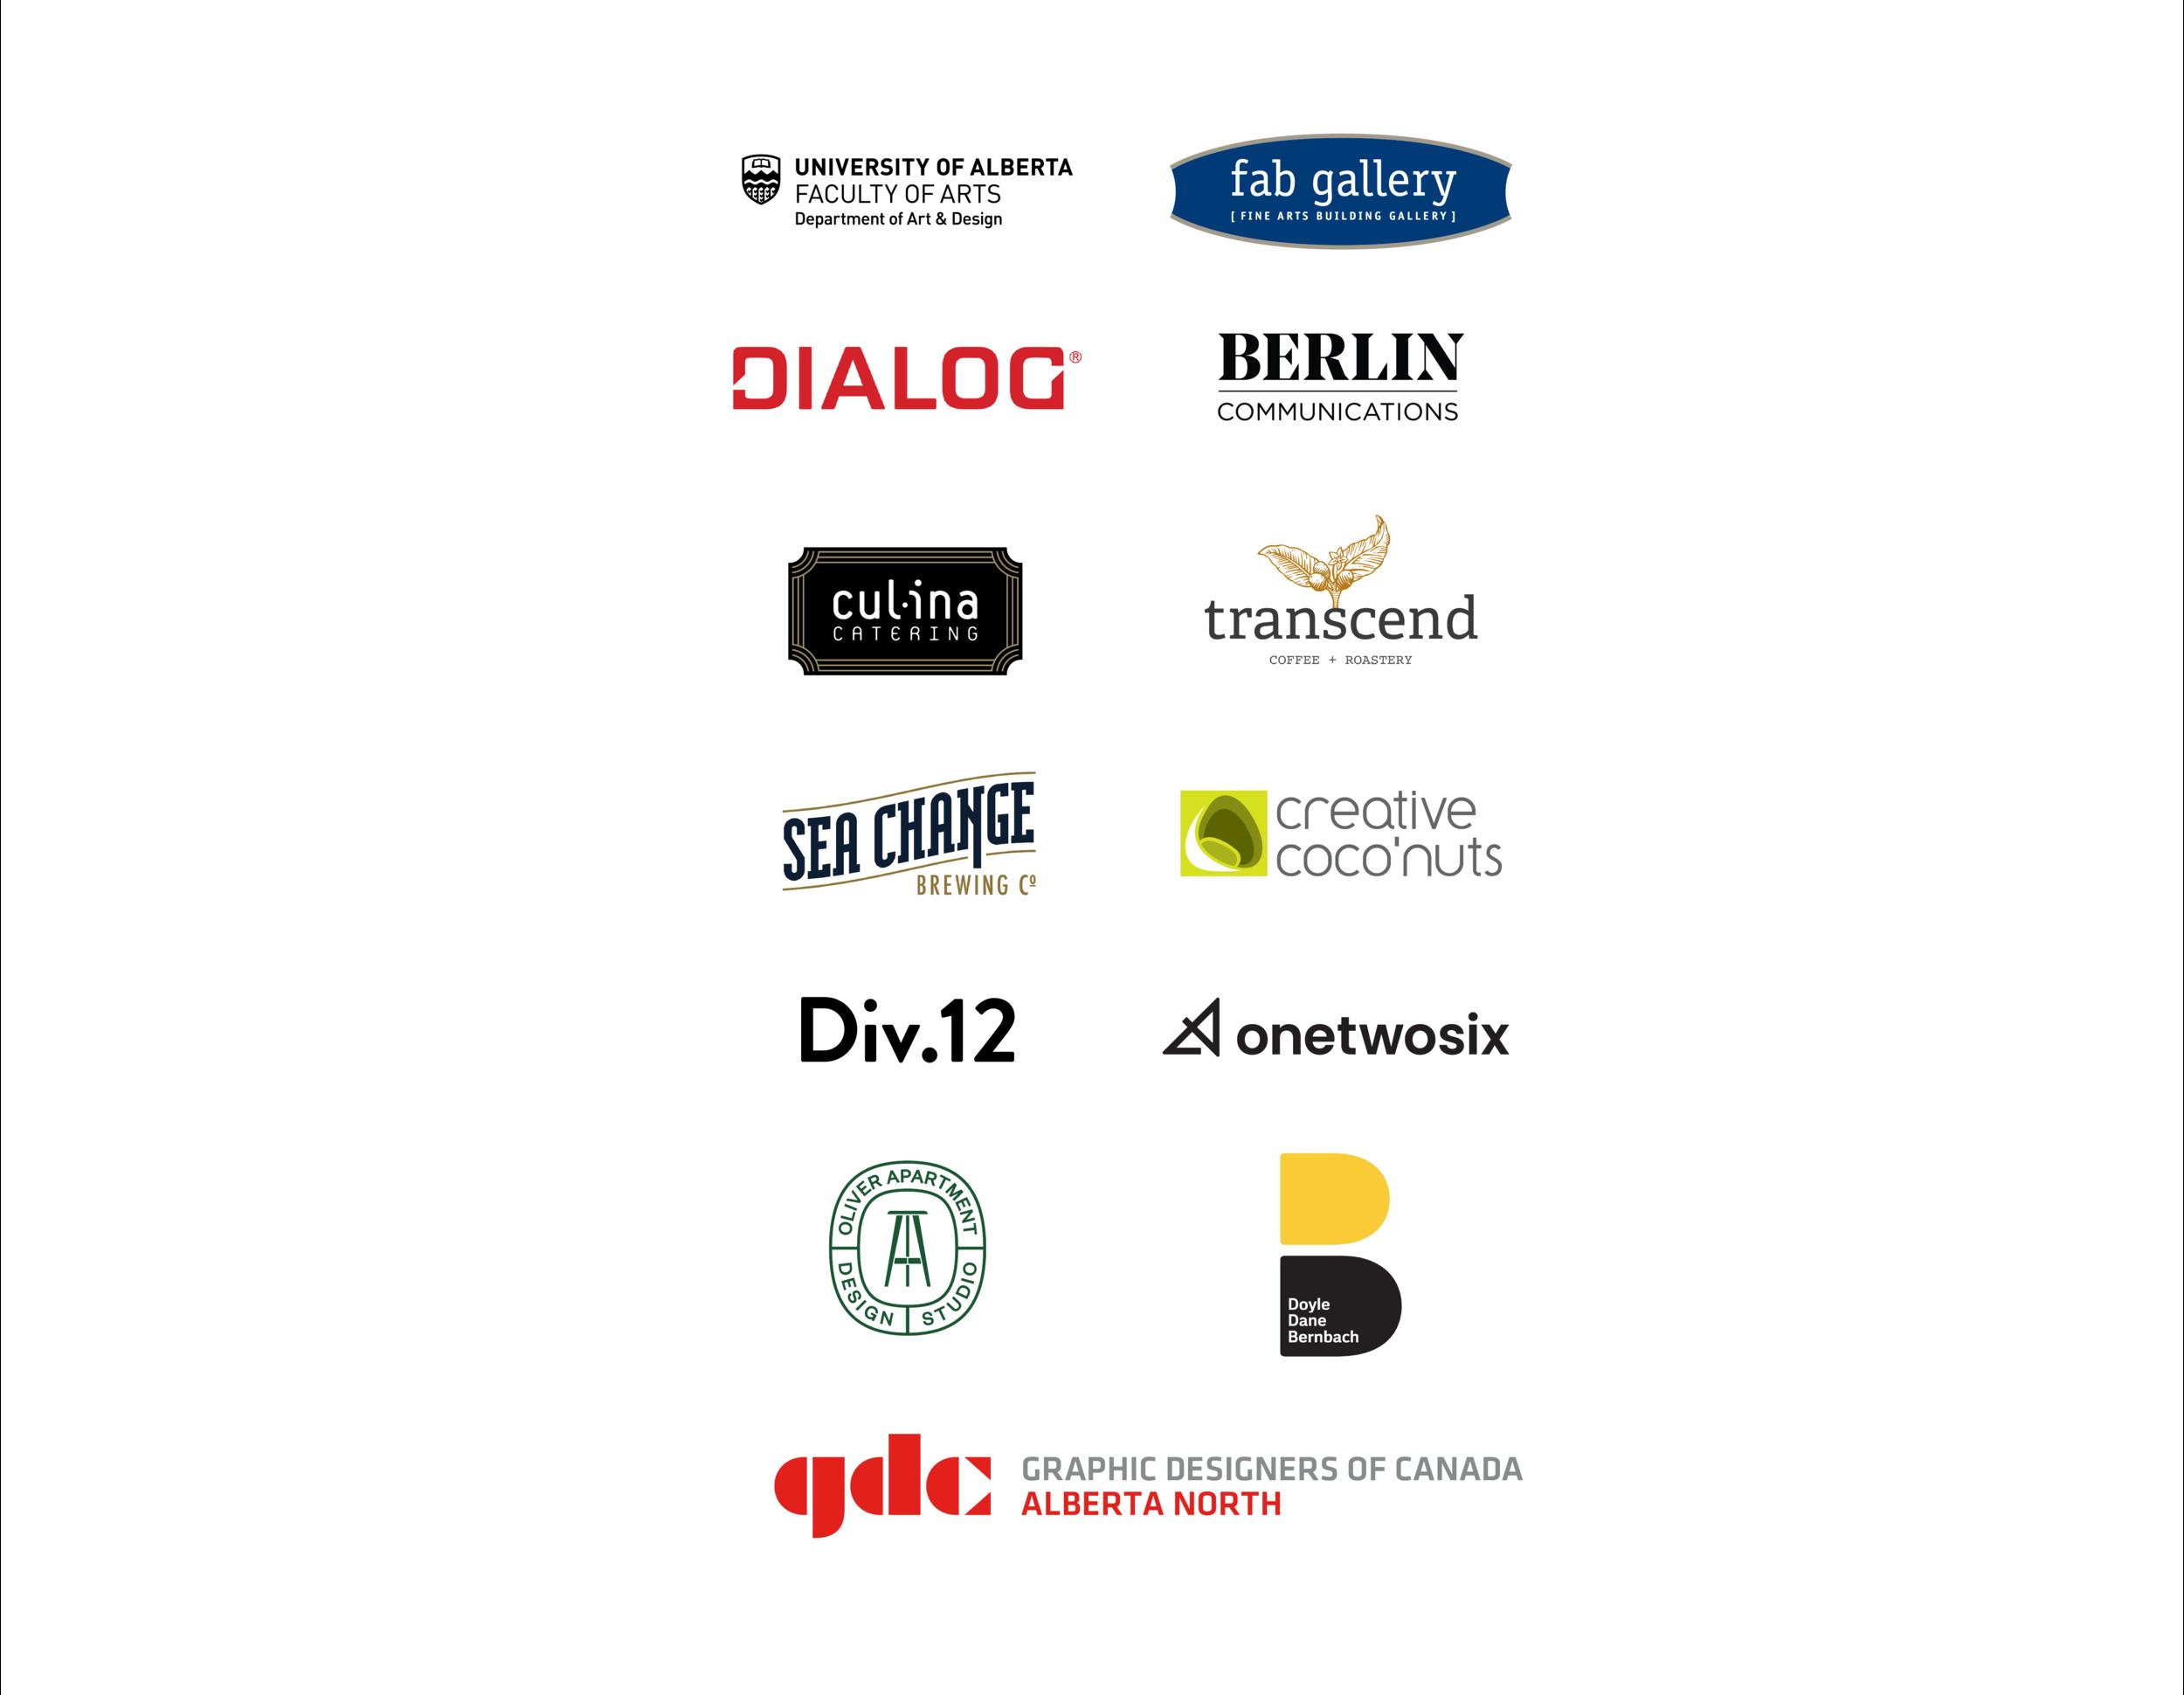 Sponsors for Grad Showgradient.png